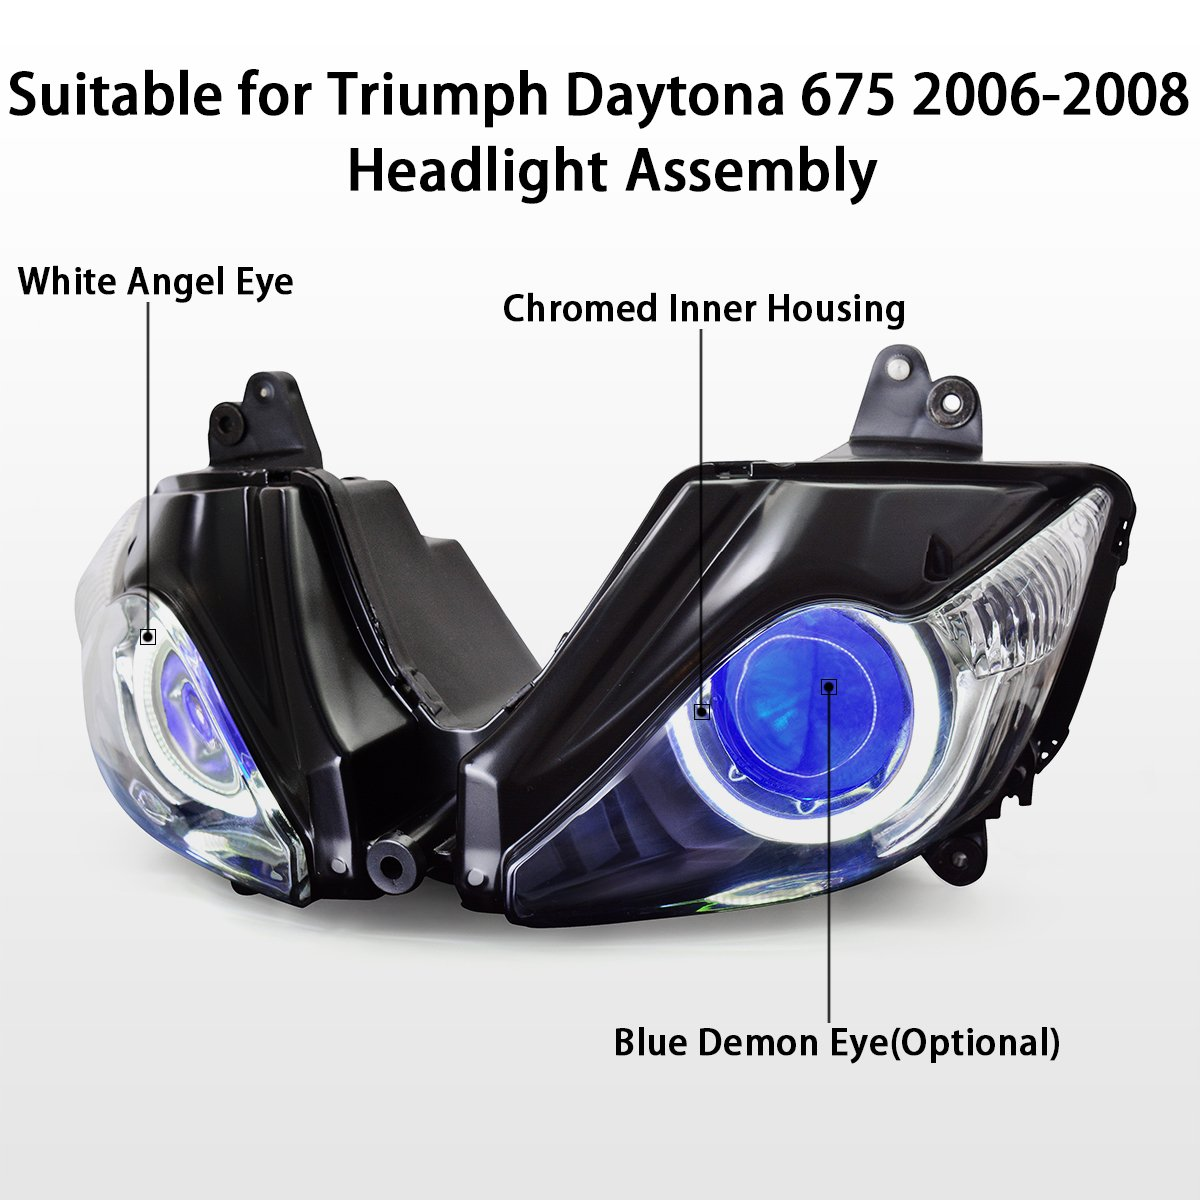 Amazon.com: KT LED Angel Eye Headlight Assembly for Triumph Daytona 675 2006-2008  Blue Demon Eye: Automotive